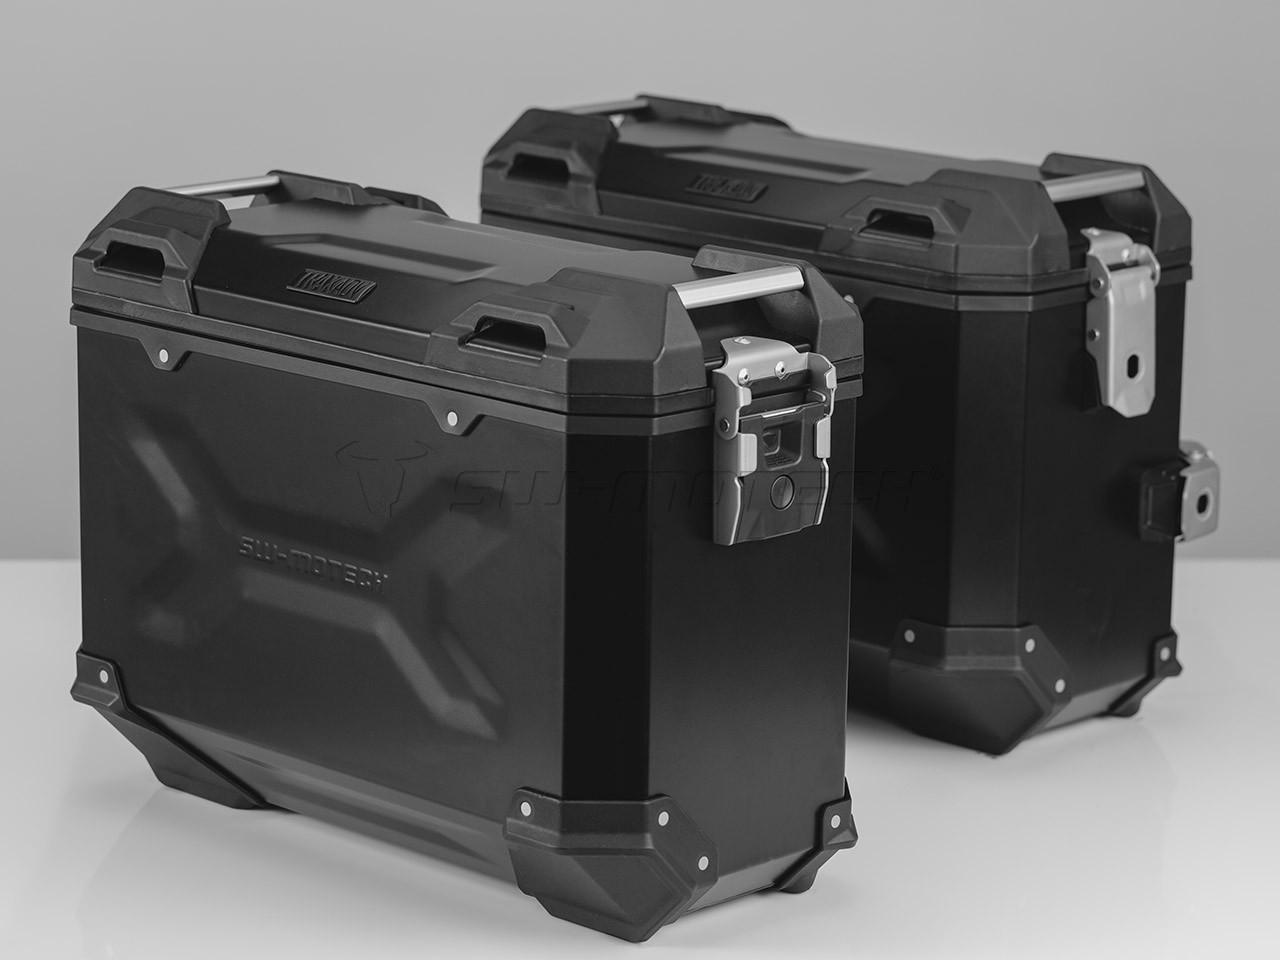 Honda VFR 1200 X Crosstourer (11-) - sada bočních kufrů TRAX Adv